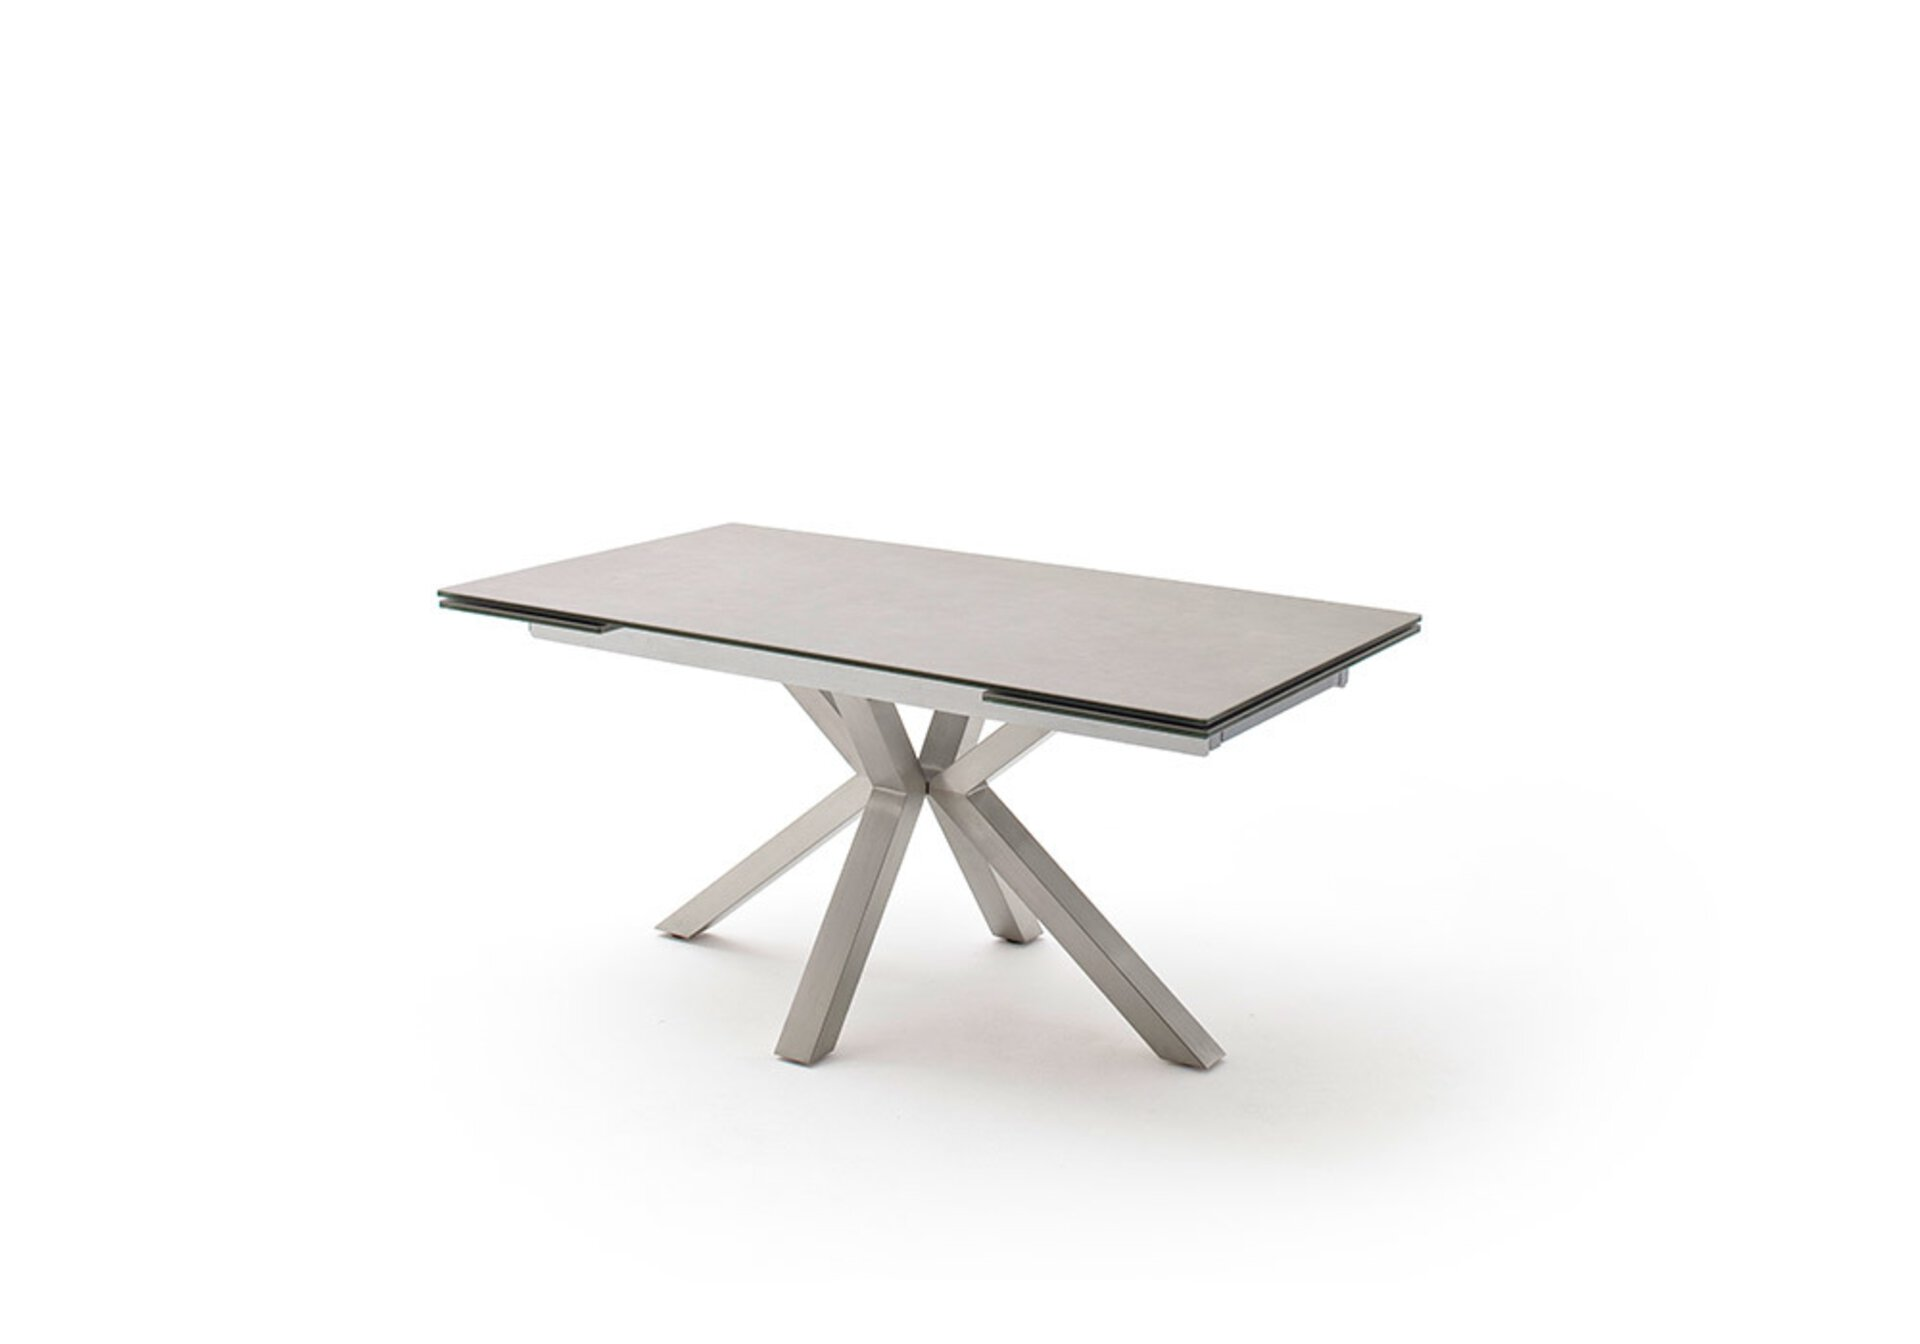 Esstisch NAGANO MCA furniture Metall mehrfarbig 90 x 76 x 160 cm